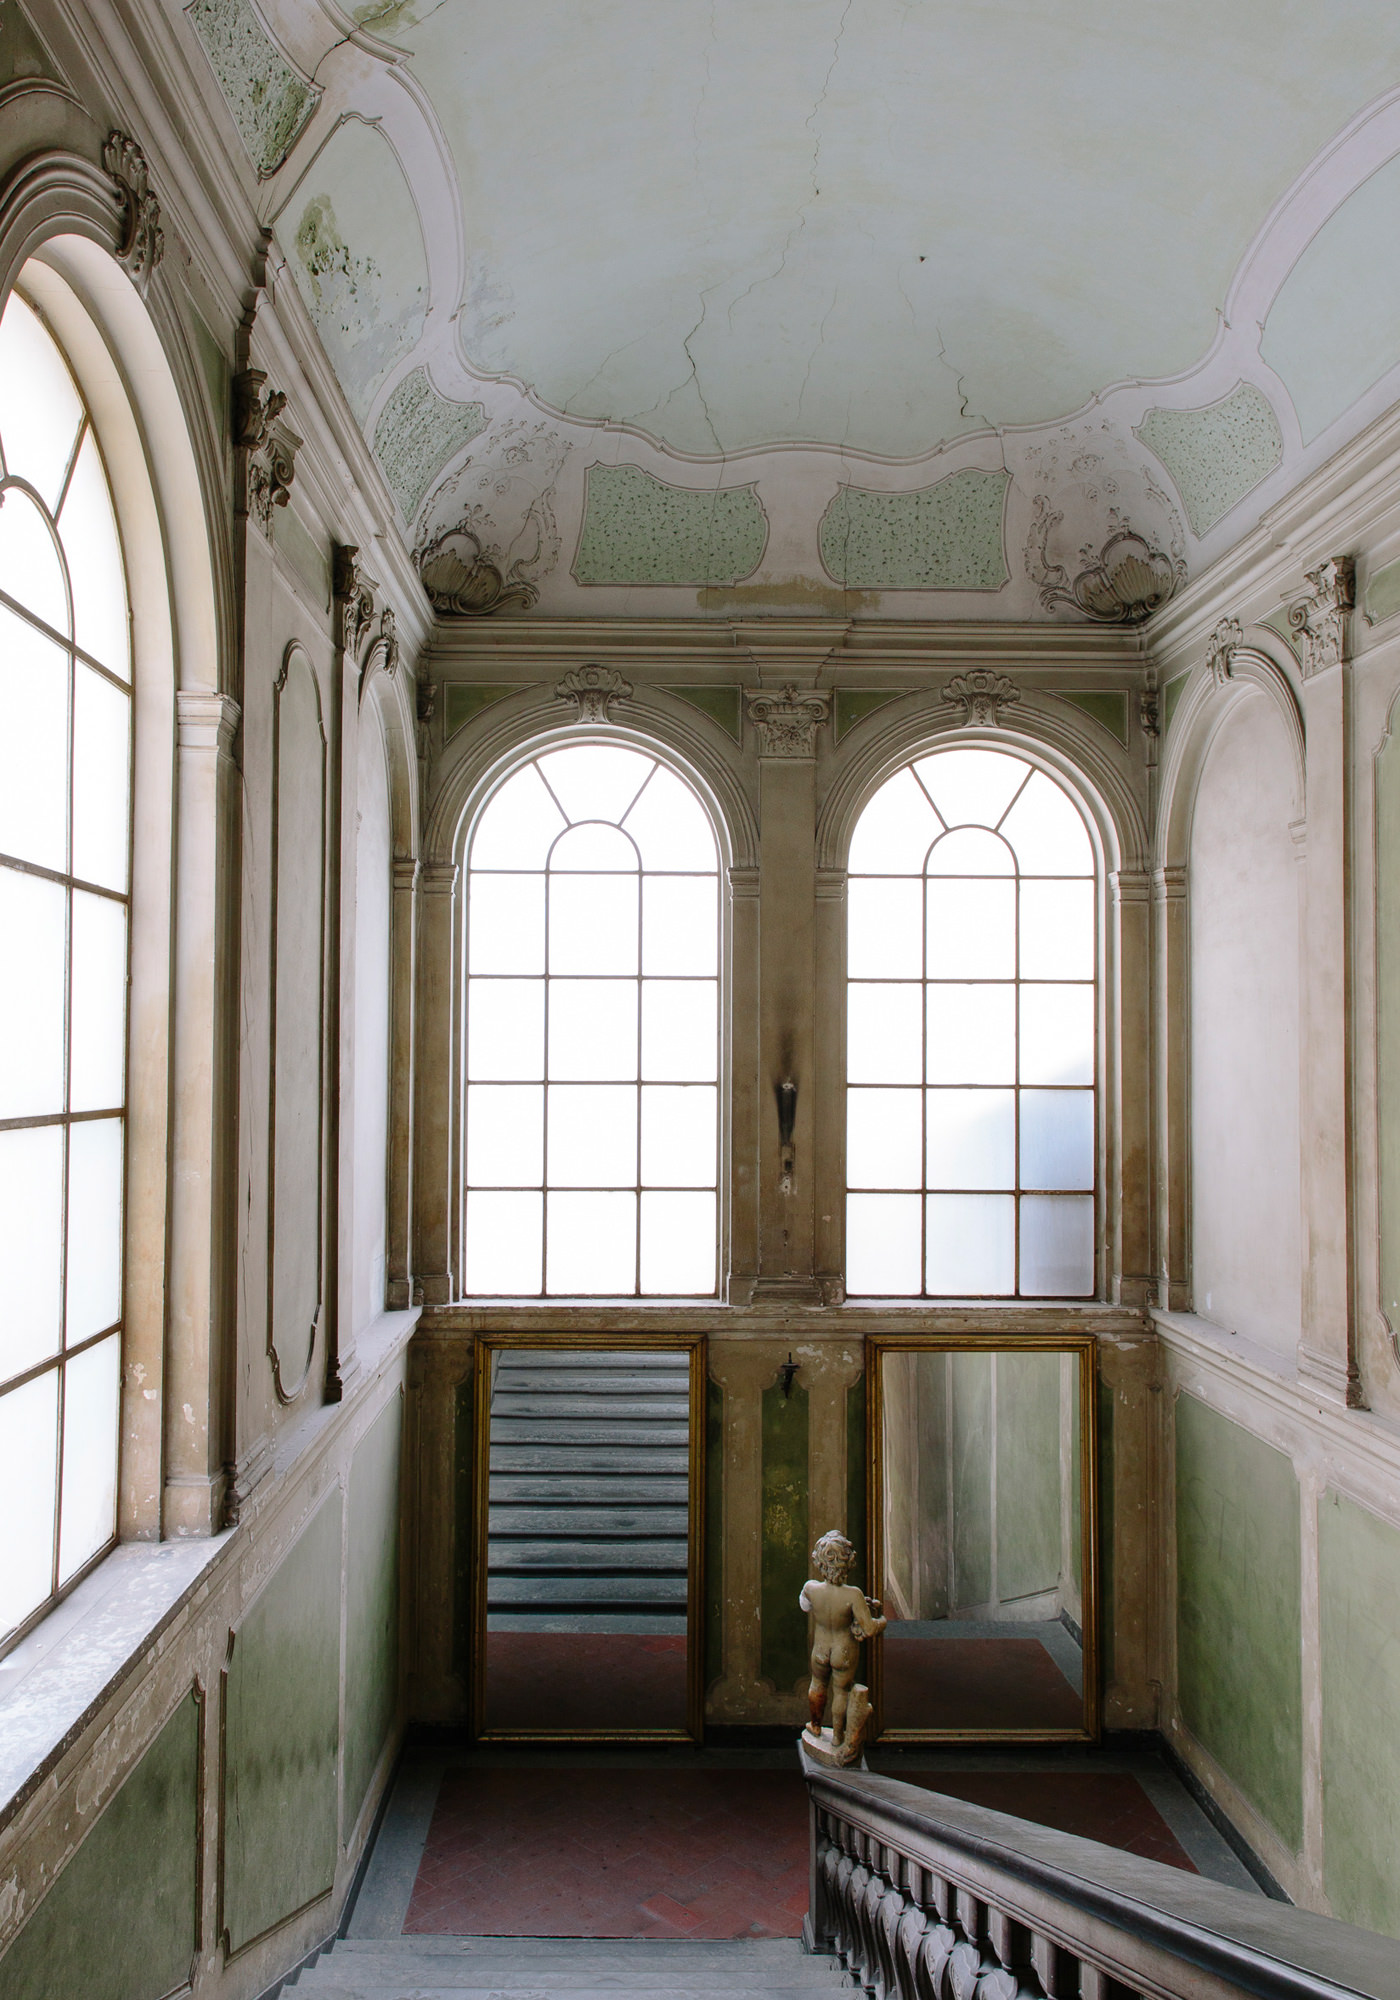 City Guide Florence Numeroventi Design Residency Hotel Santa Maria Novella (Palazzo Galli Tassi)